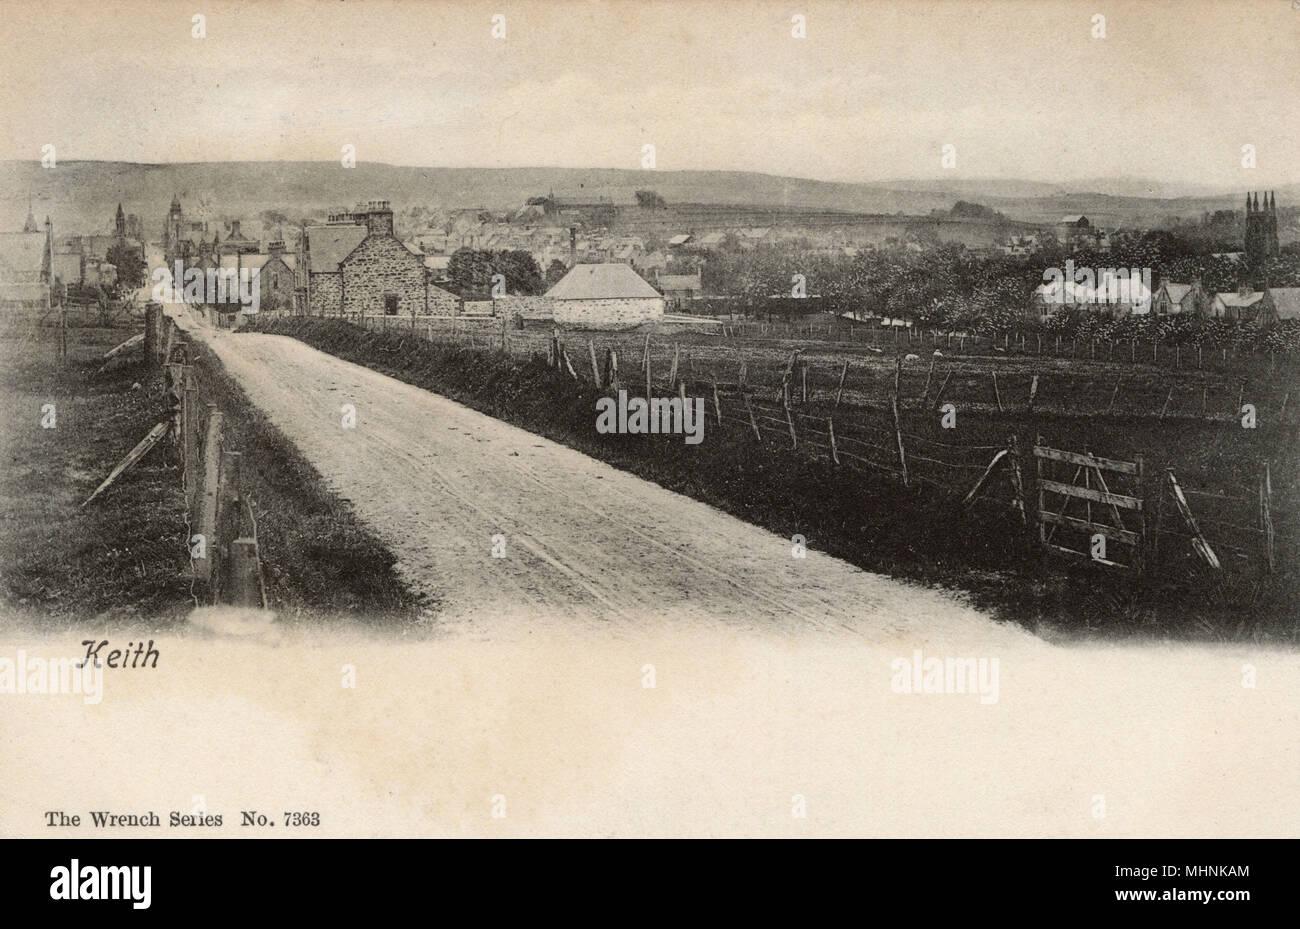 Banffshire, Scotland - Keith     Date: 1909 - Stock Image